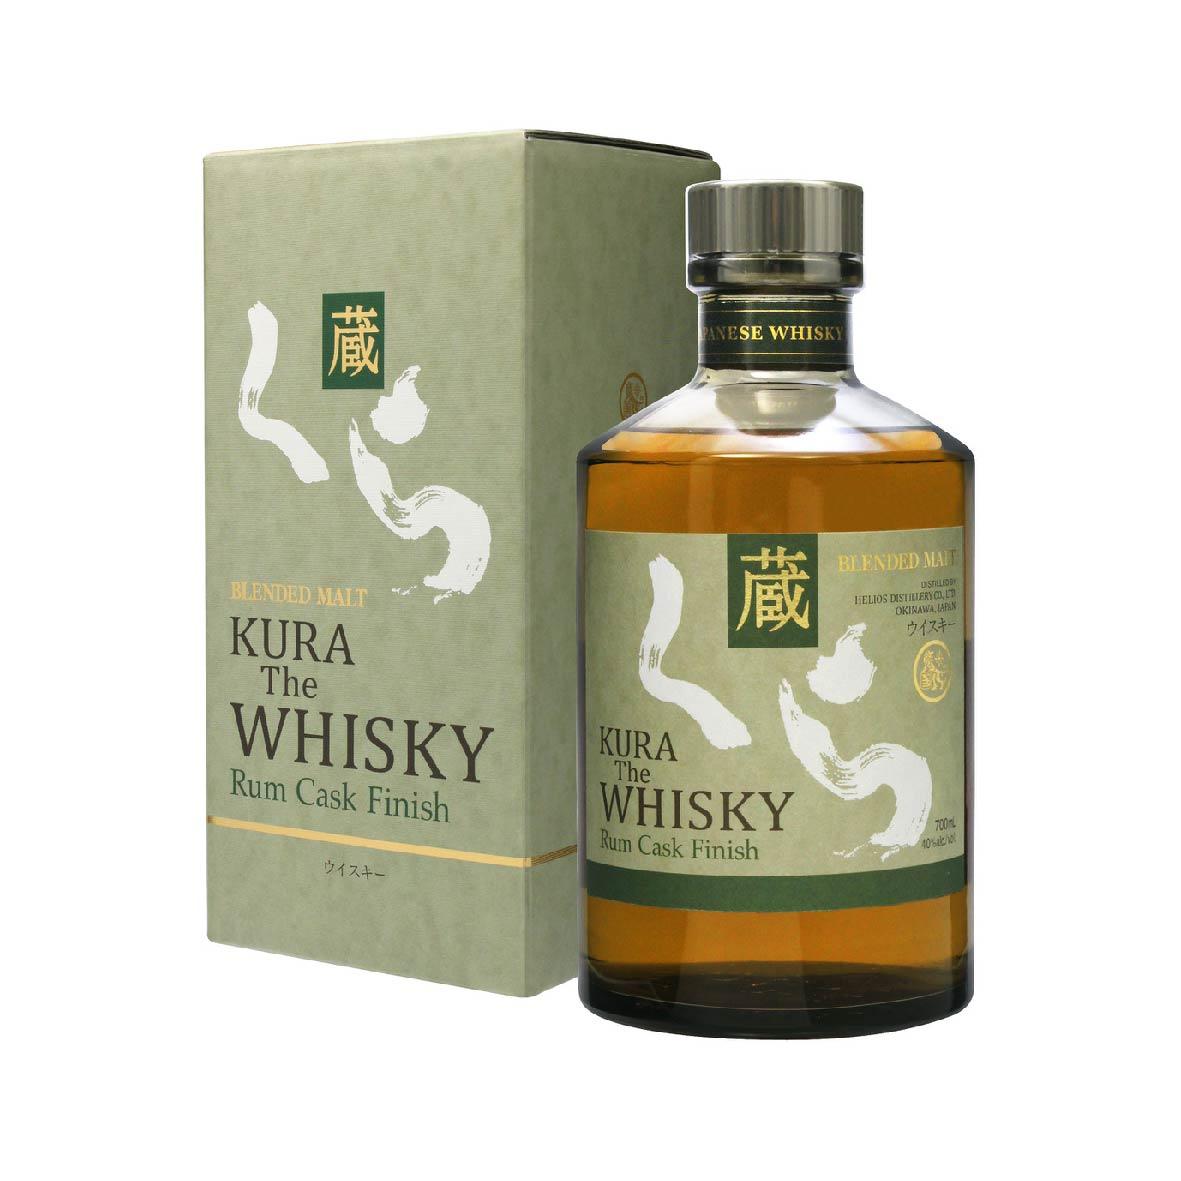 Kura The Whisky Rum Cask Finish 0,7 l